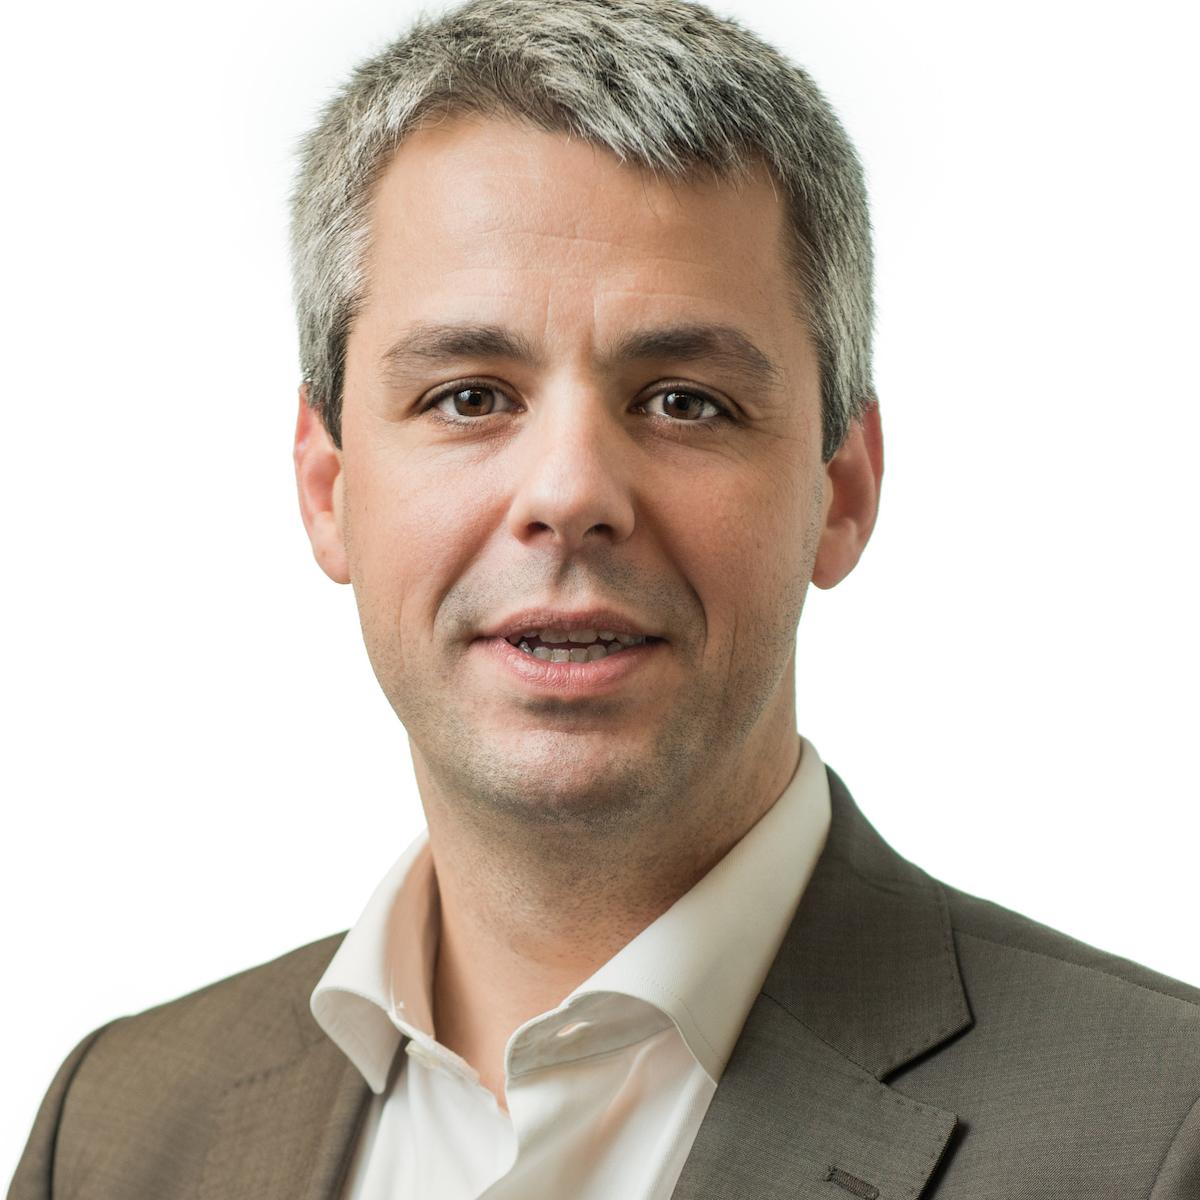 Alexandre Guérin - Directeur Général d'Ipsos France